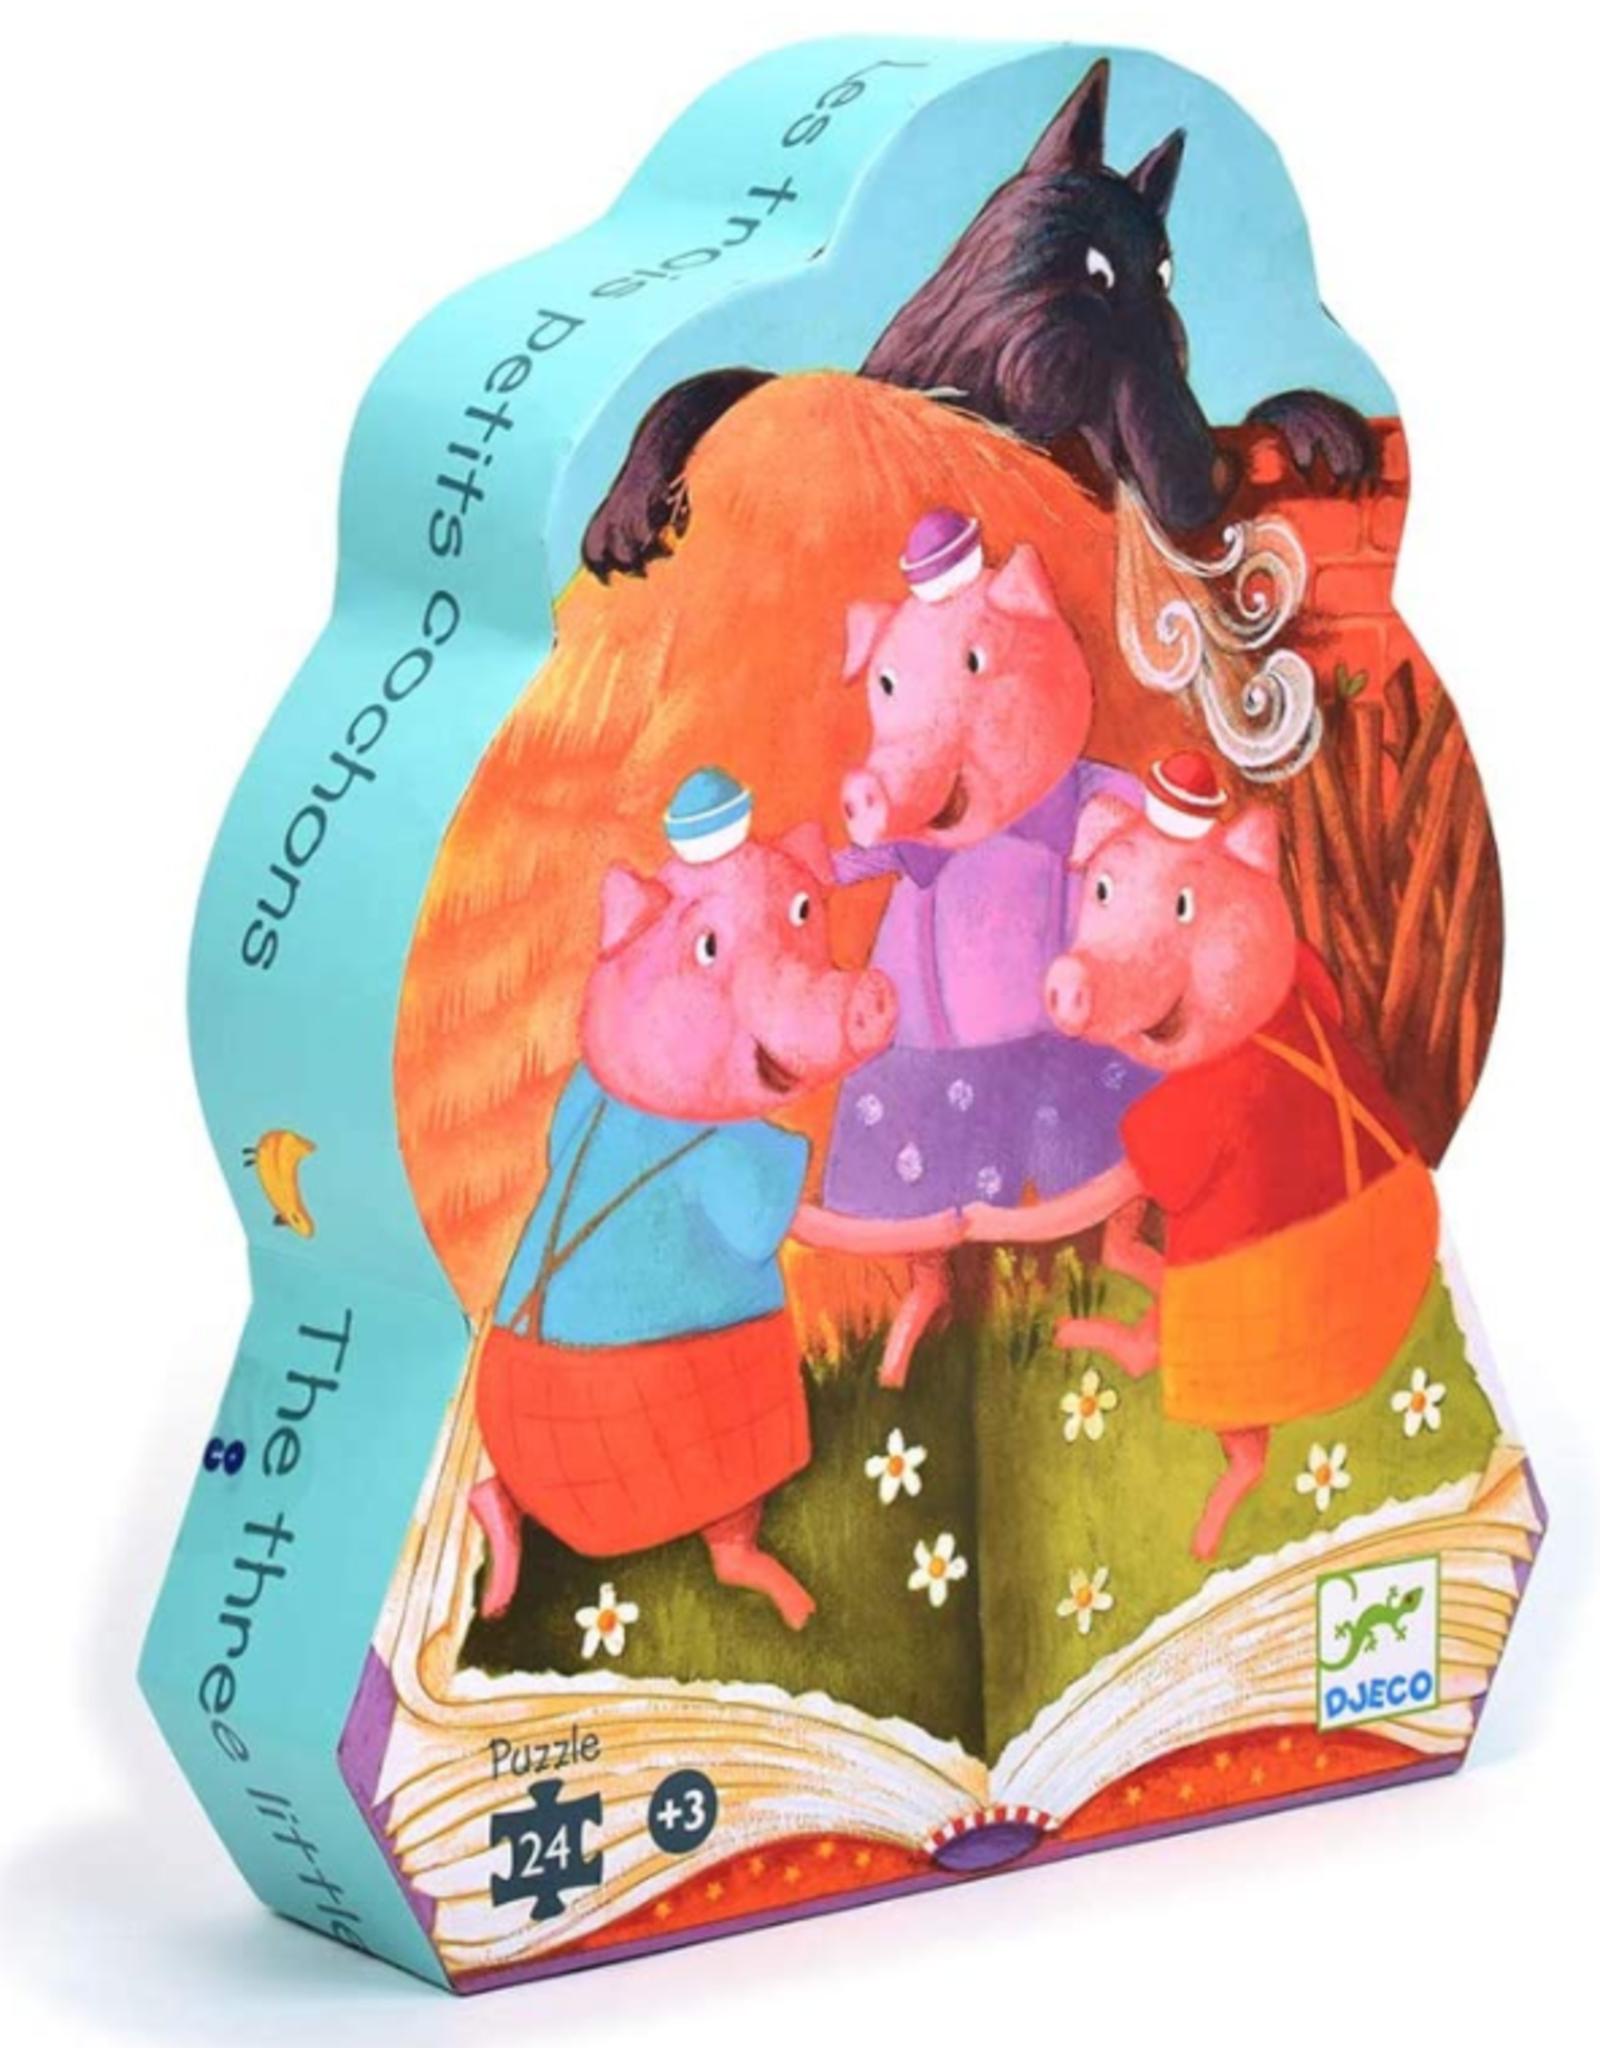 Djeco Silhouette Puzzles - The 3 Little Pigs - 24pcs